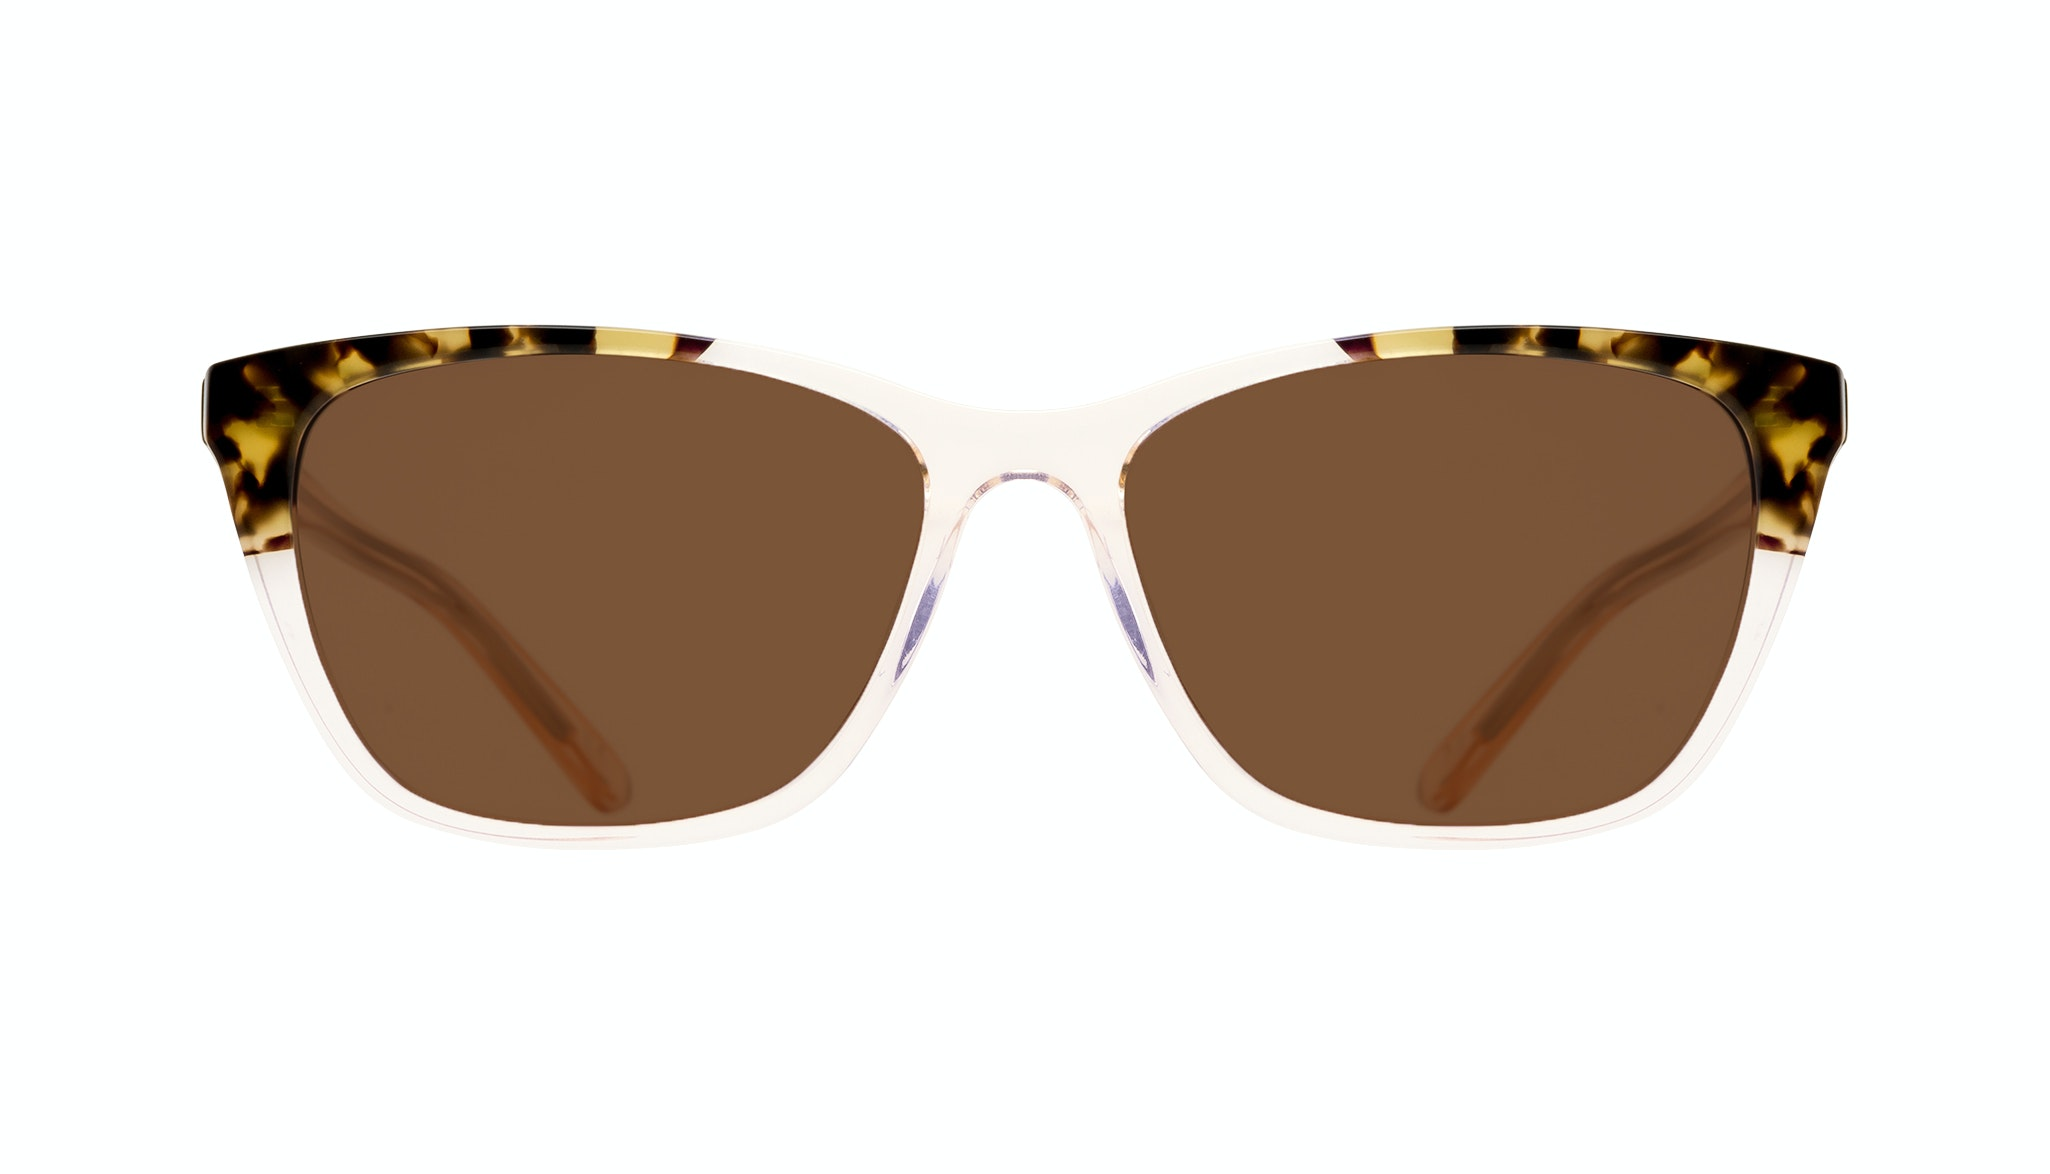 Affordable Fashion Glasses Cat Eye Rectangle Sunglasses Women Myrtle Blond Tortoise Front